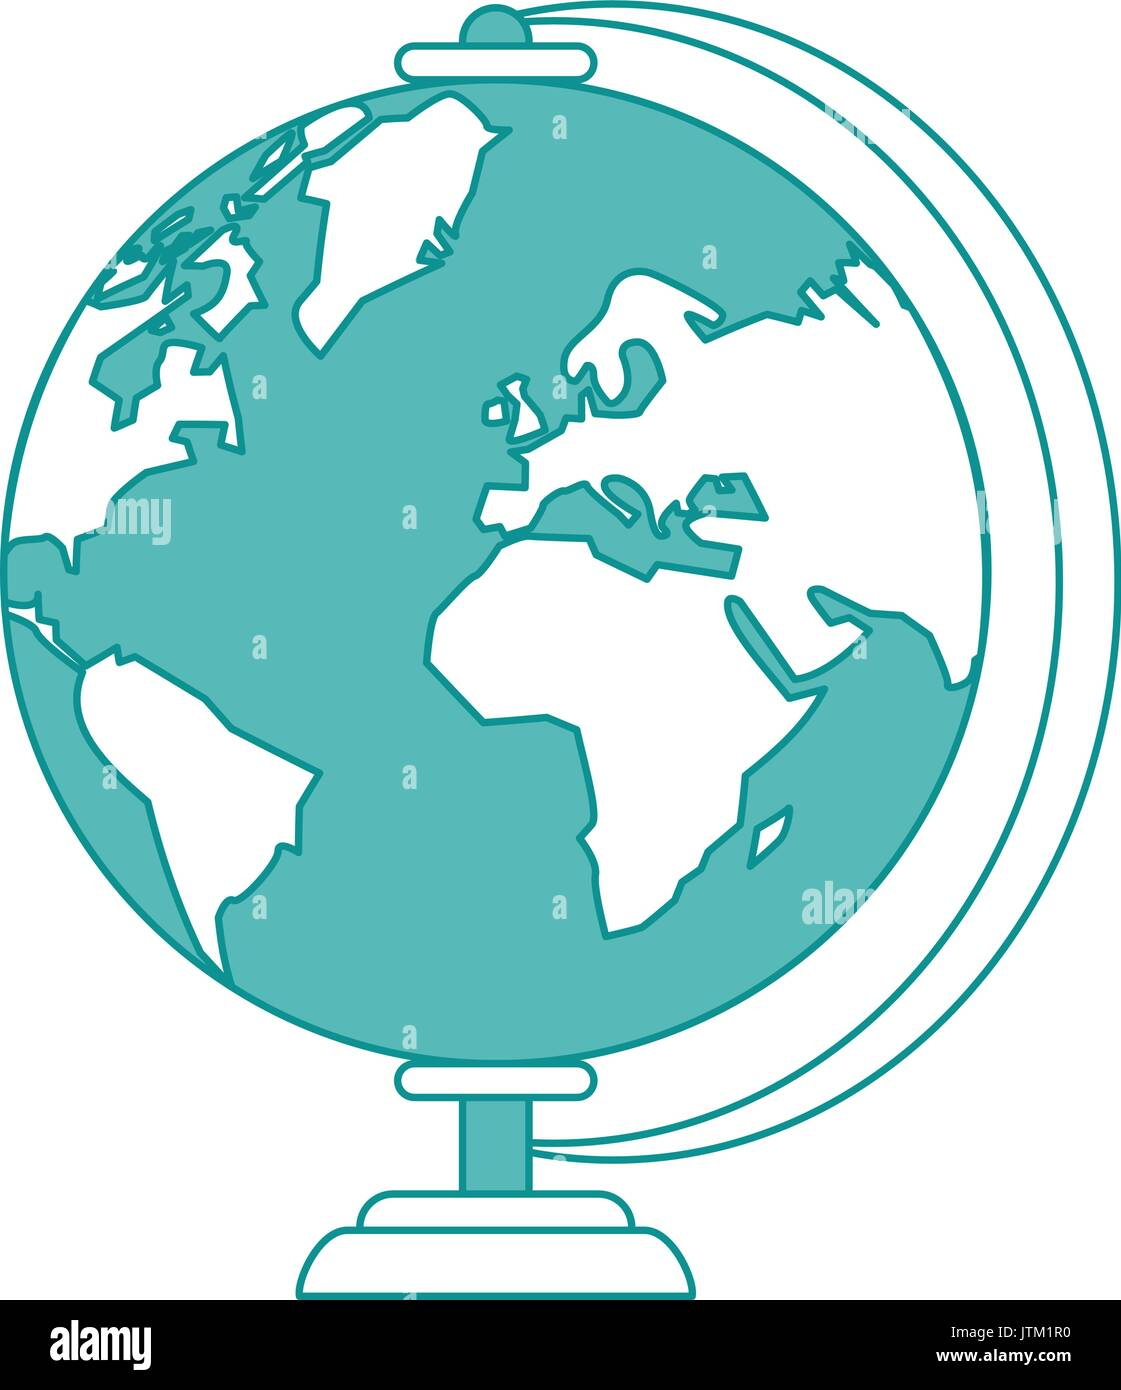 globe vector illustration - Stock Vector